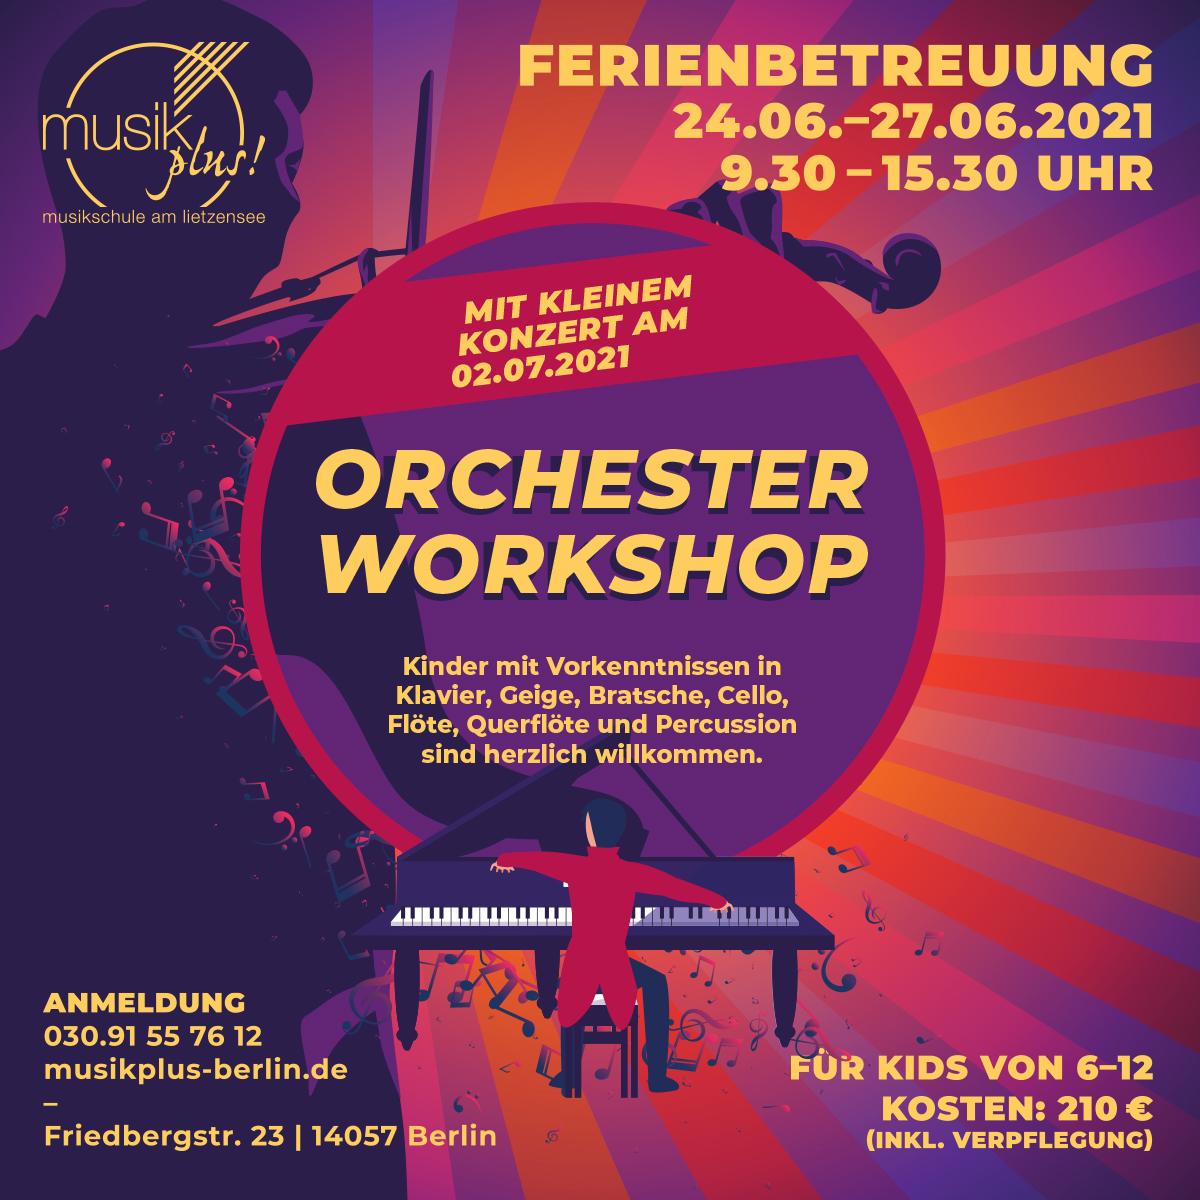 Orchesterworkshop